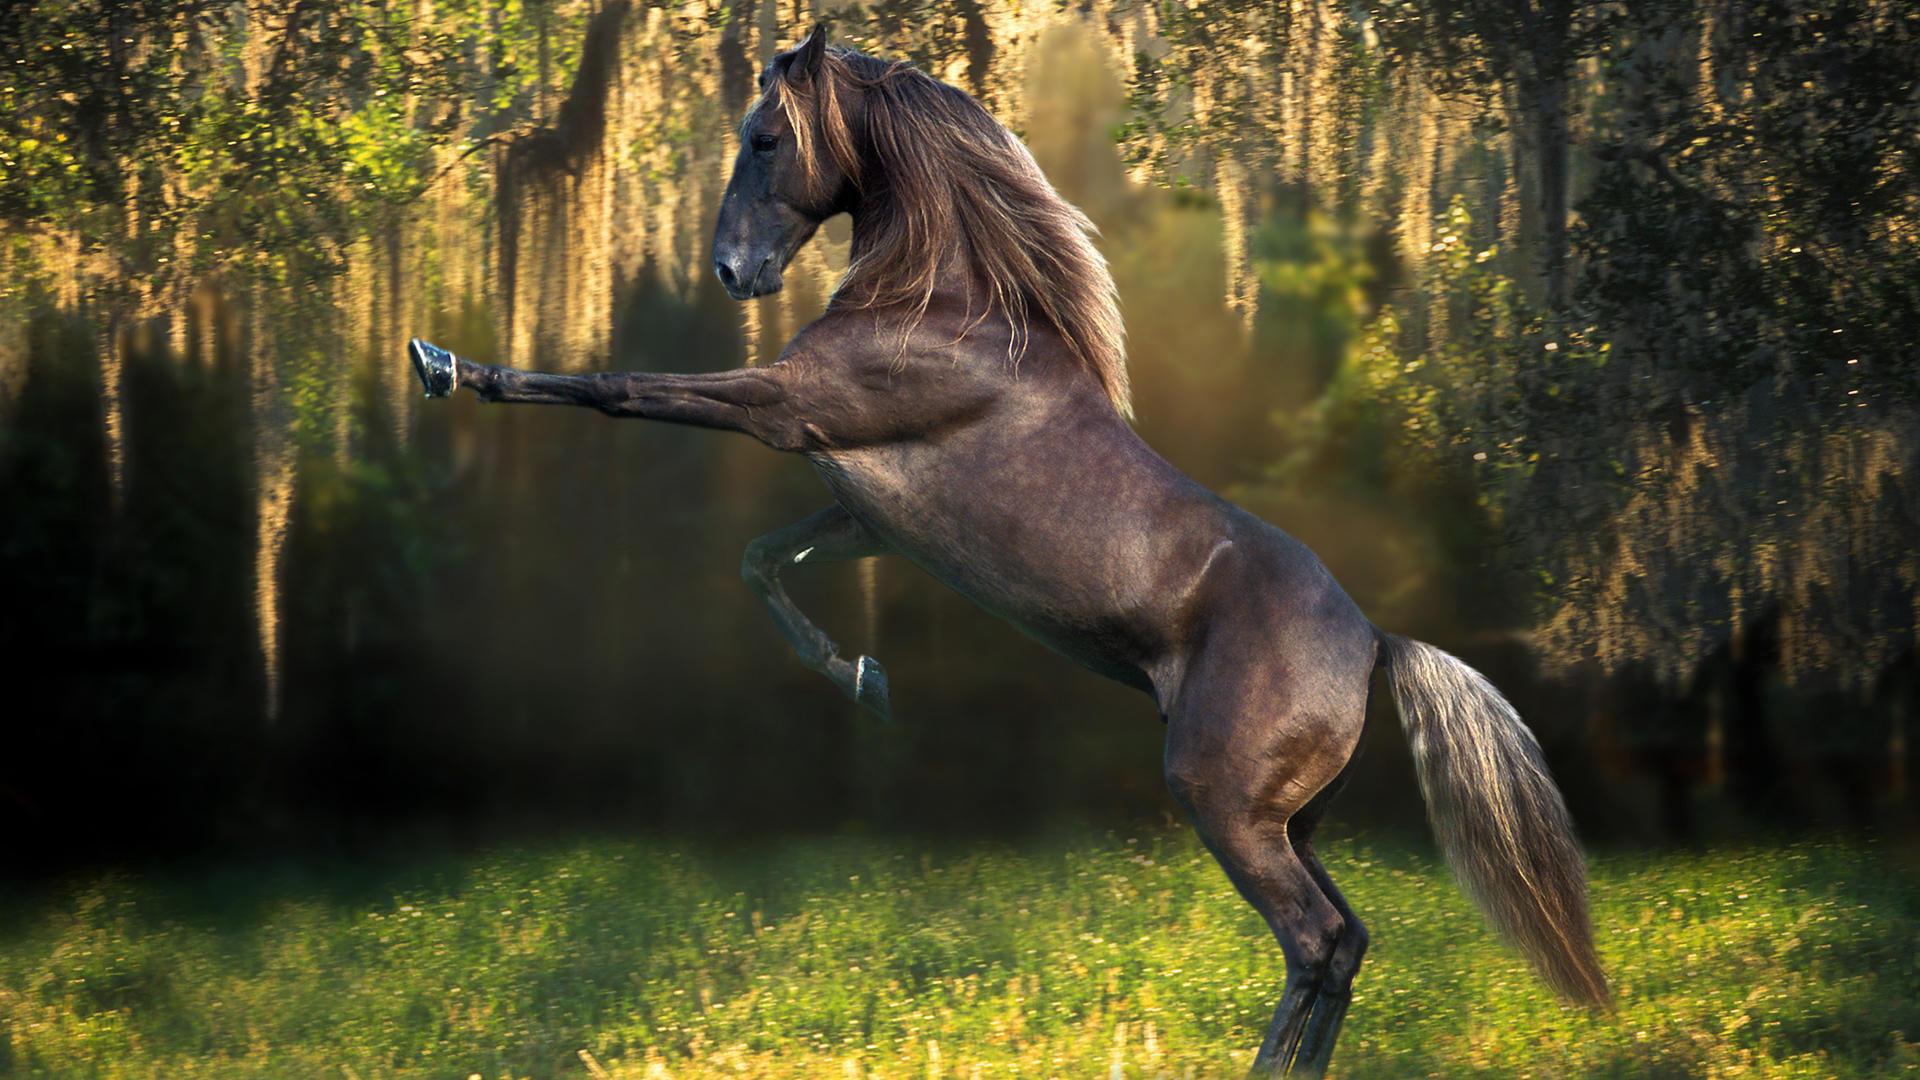 horse desktop wallpaper Desktop Backgrounds for HD Wallpaper 1920x1080